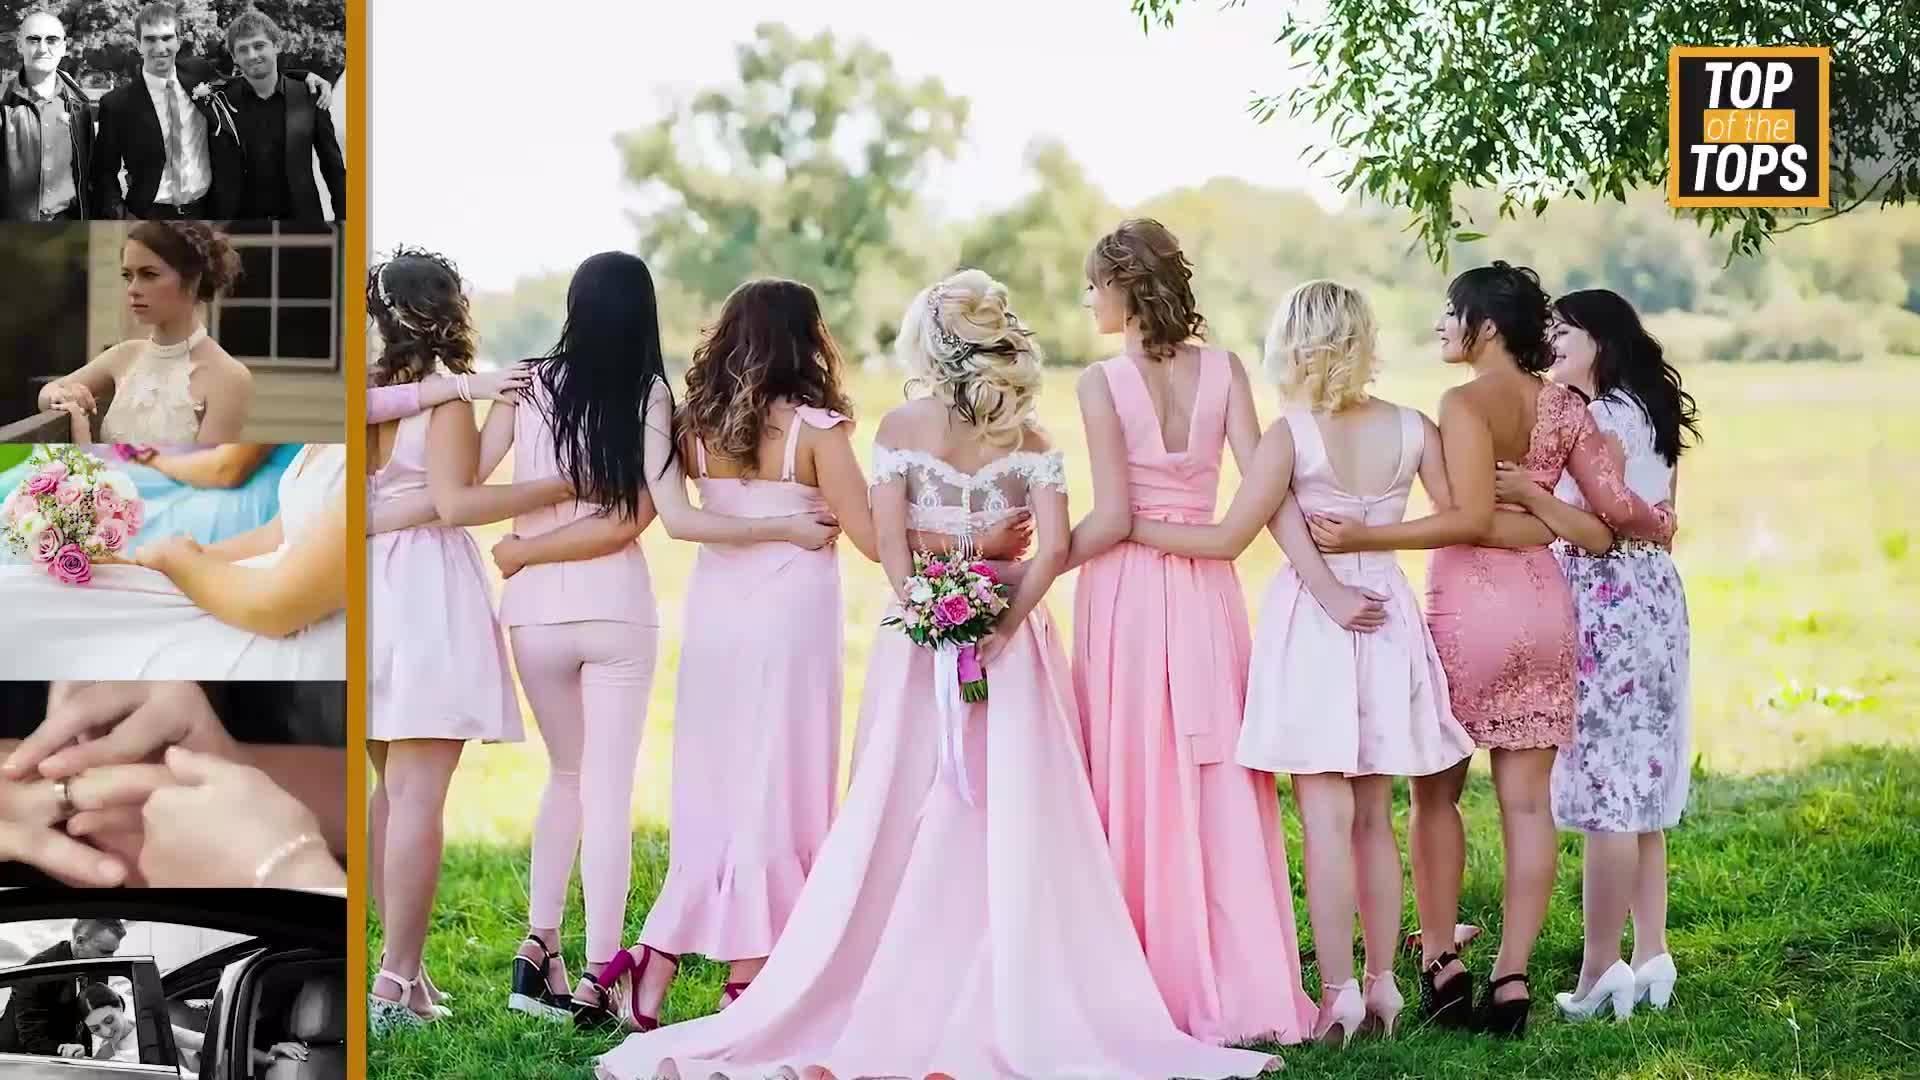 Интересни факти за сватбените традиции